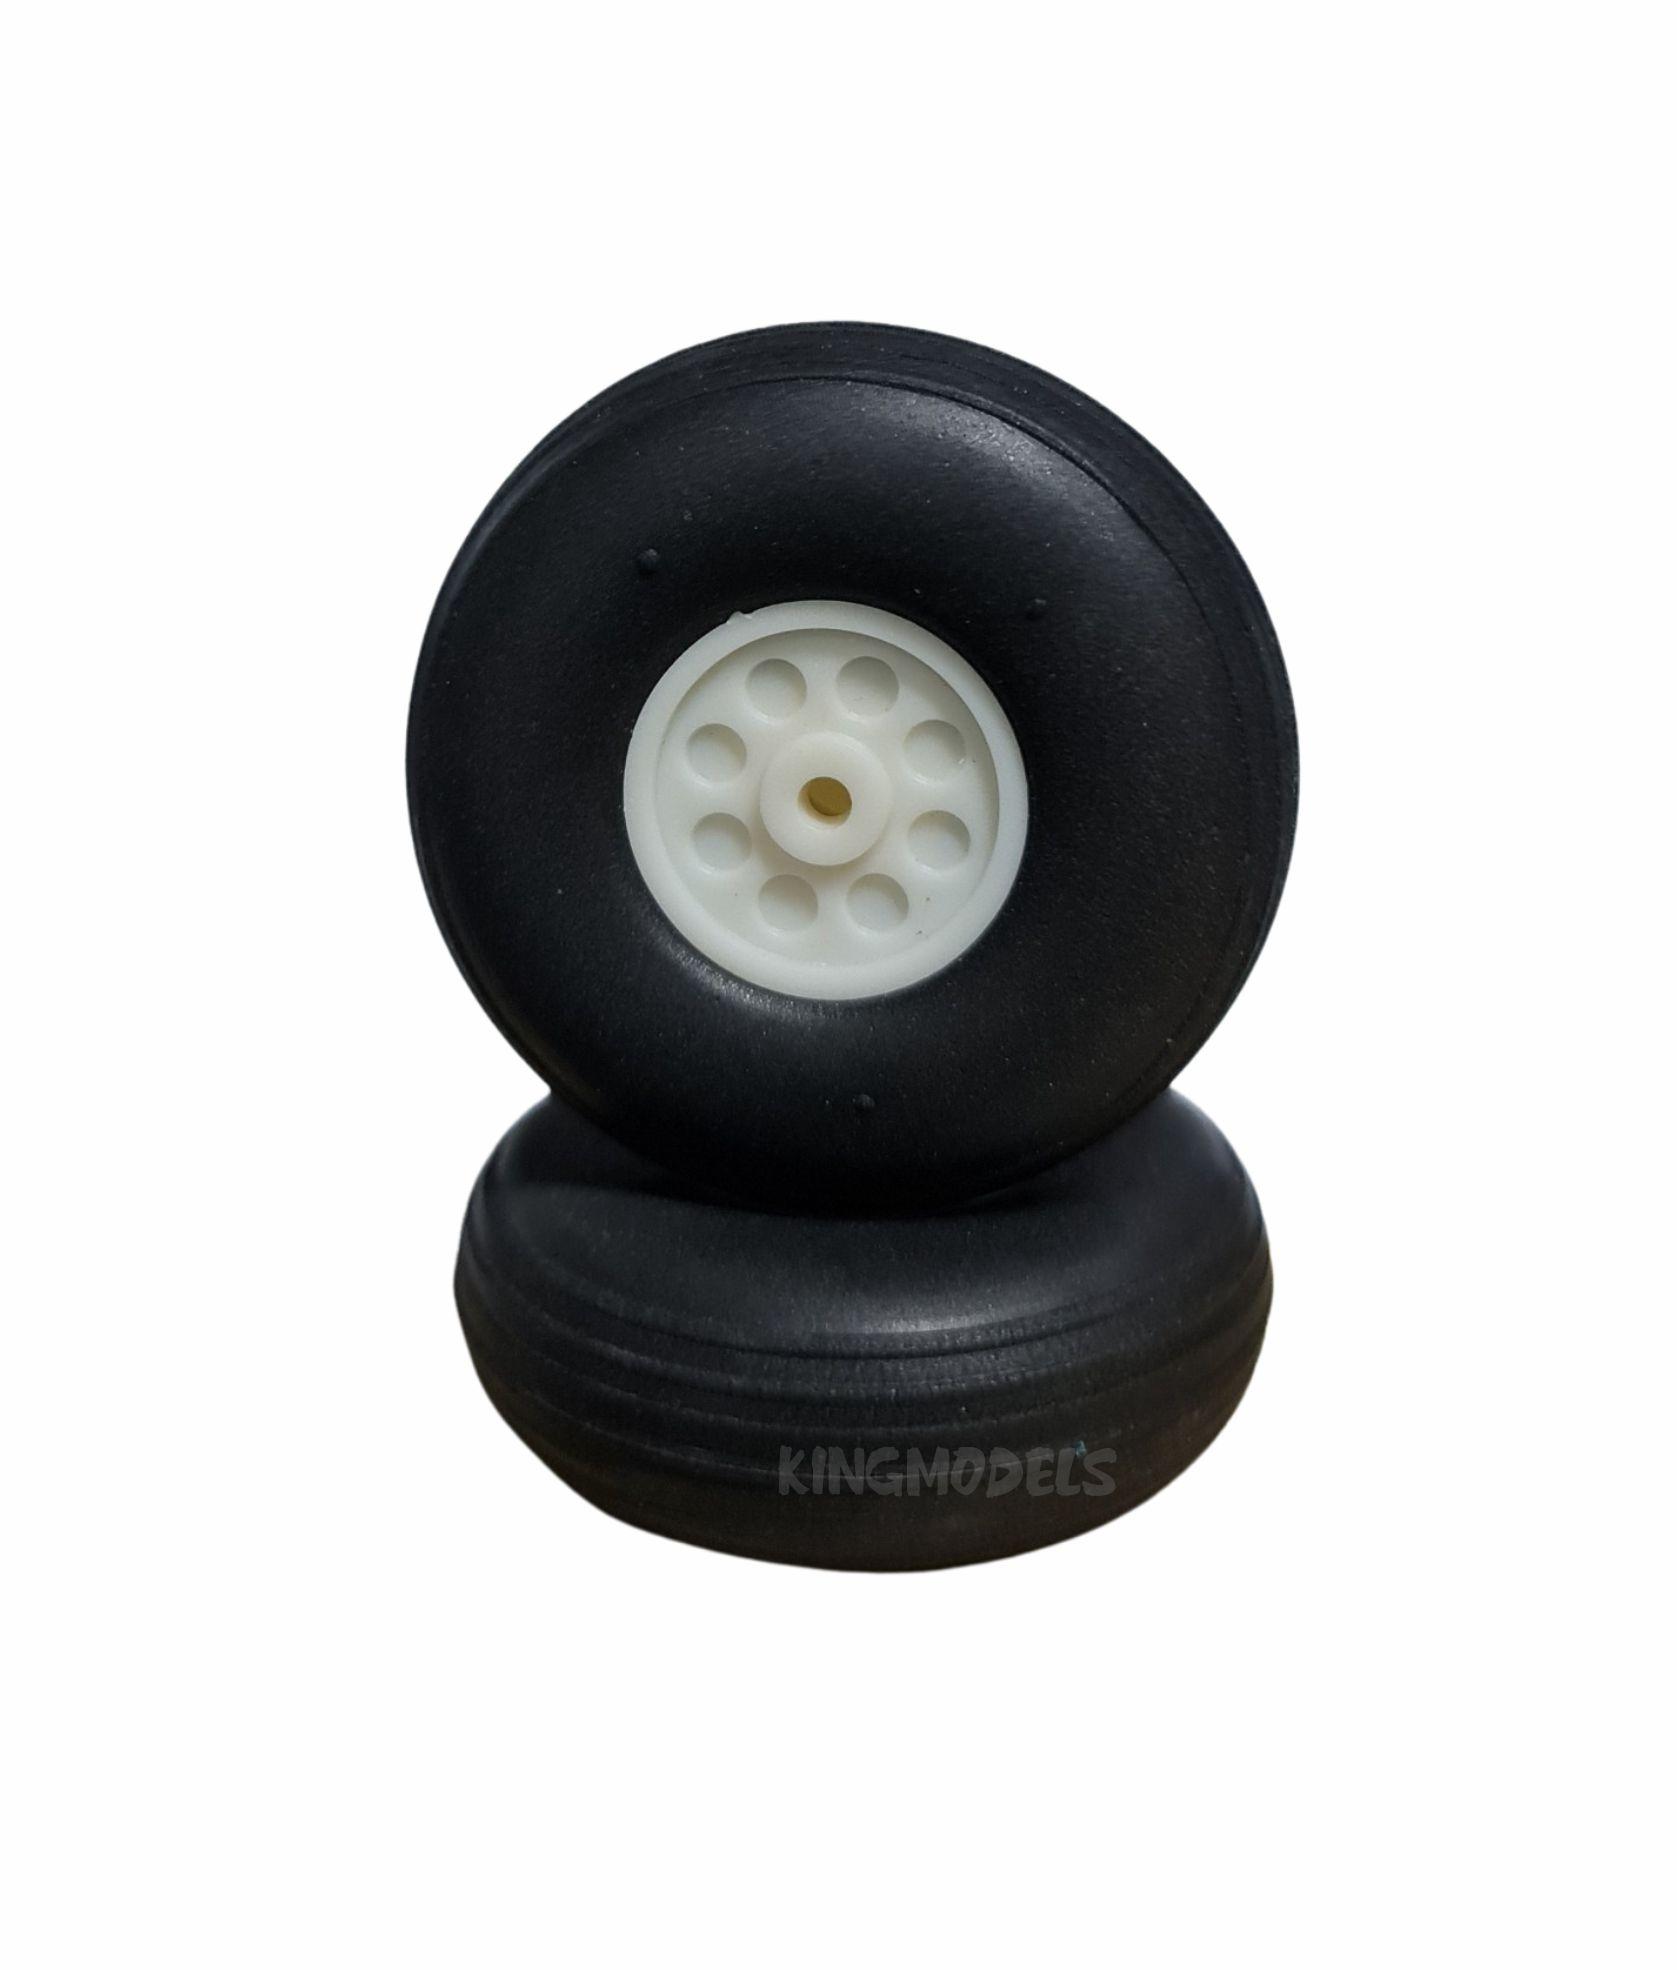 Roda De Borracha Extra-leve E Cubo Nylon-25mm - (2pçs)  - King Models